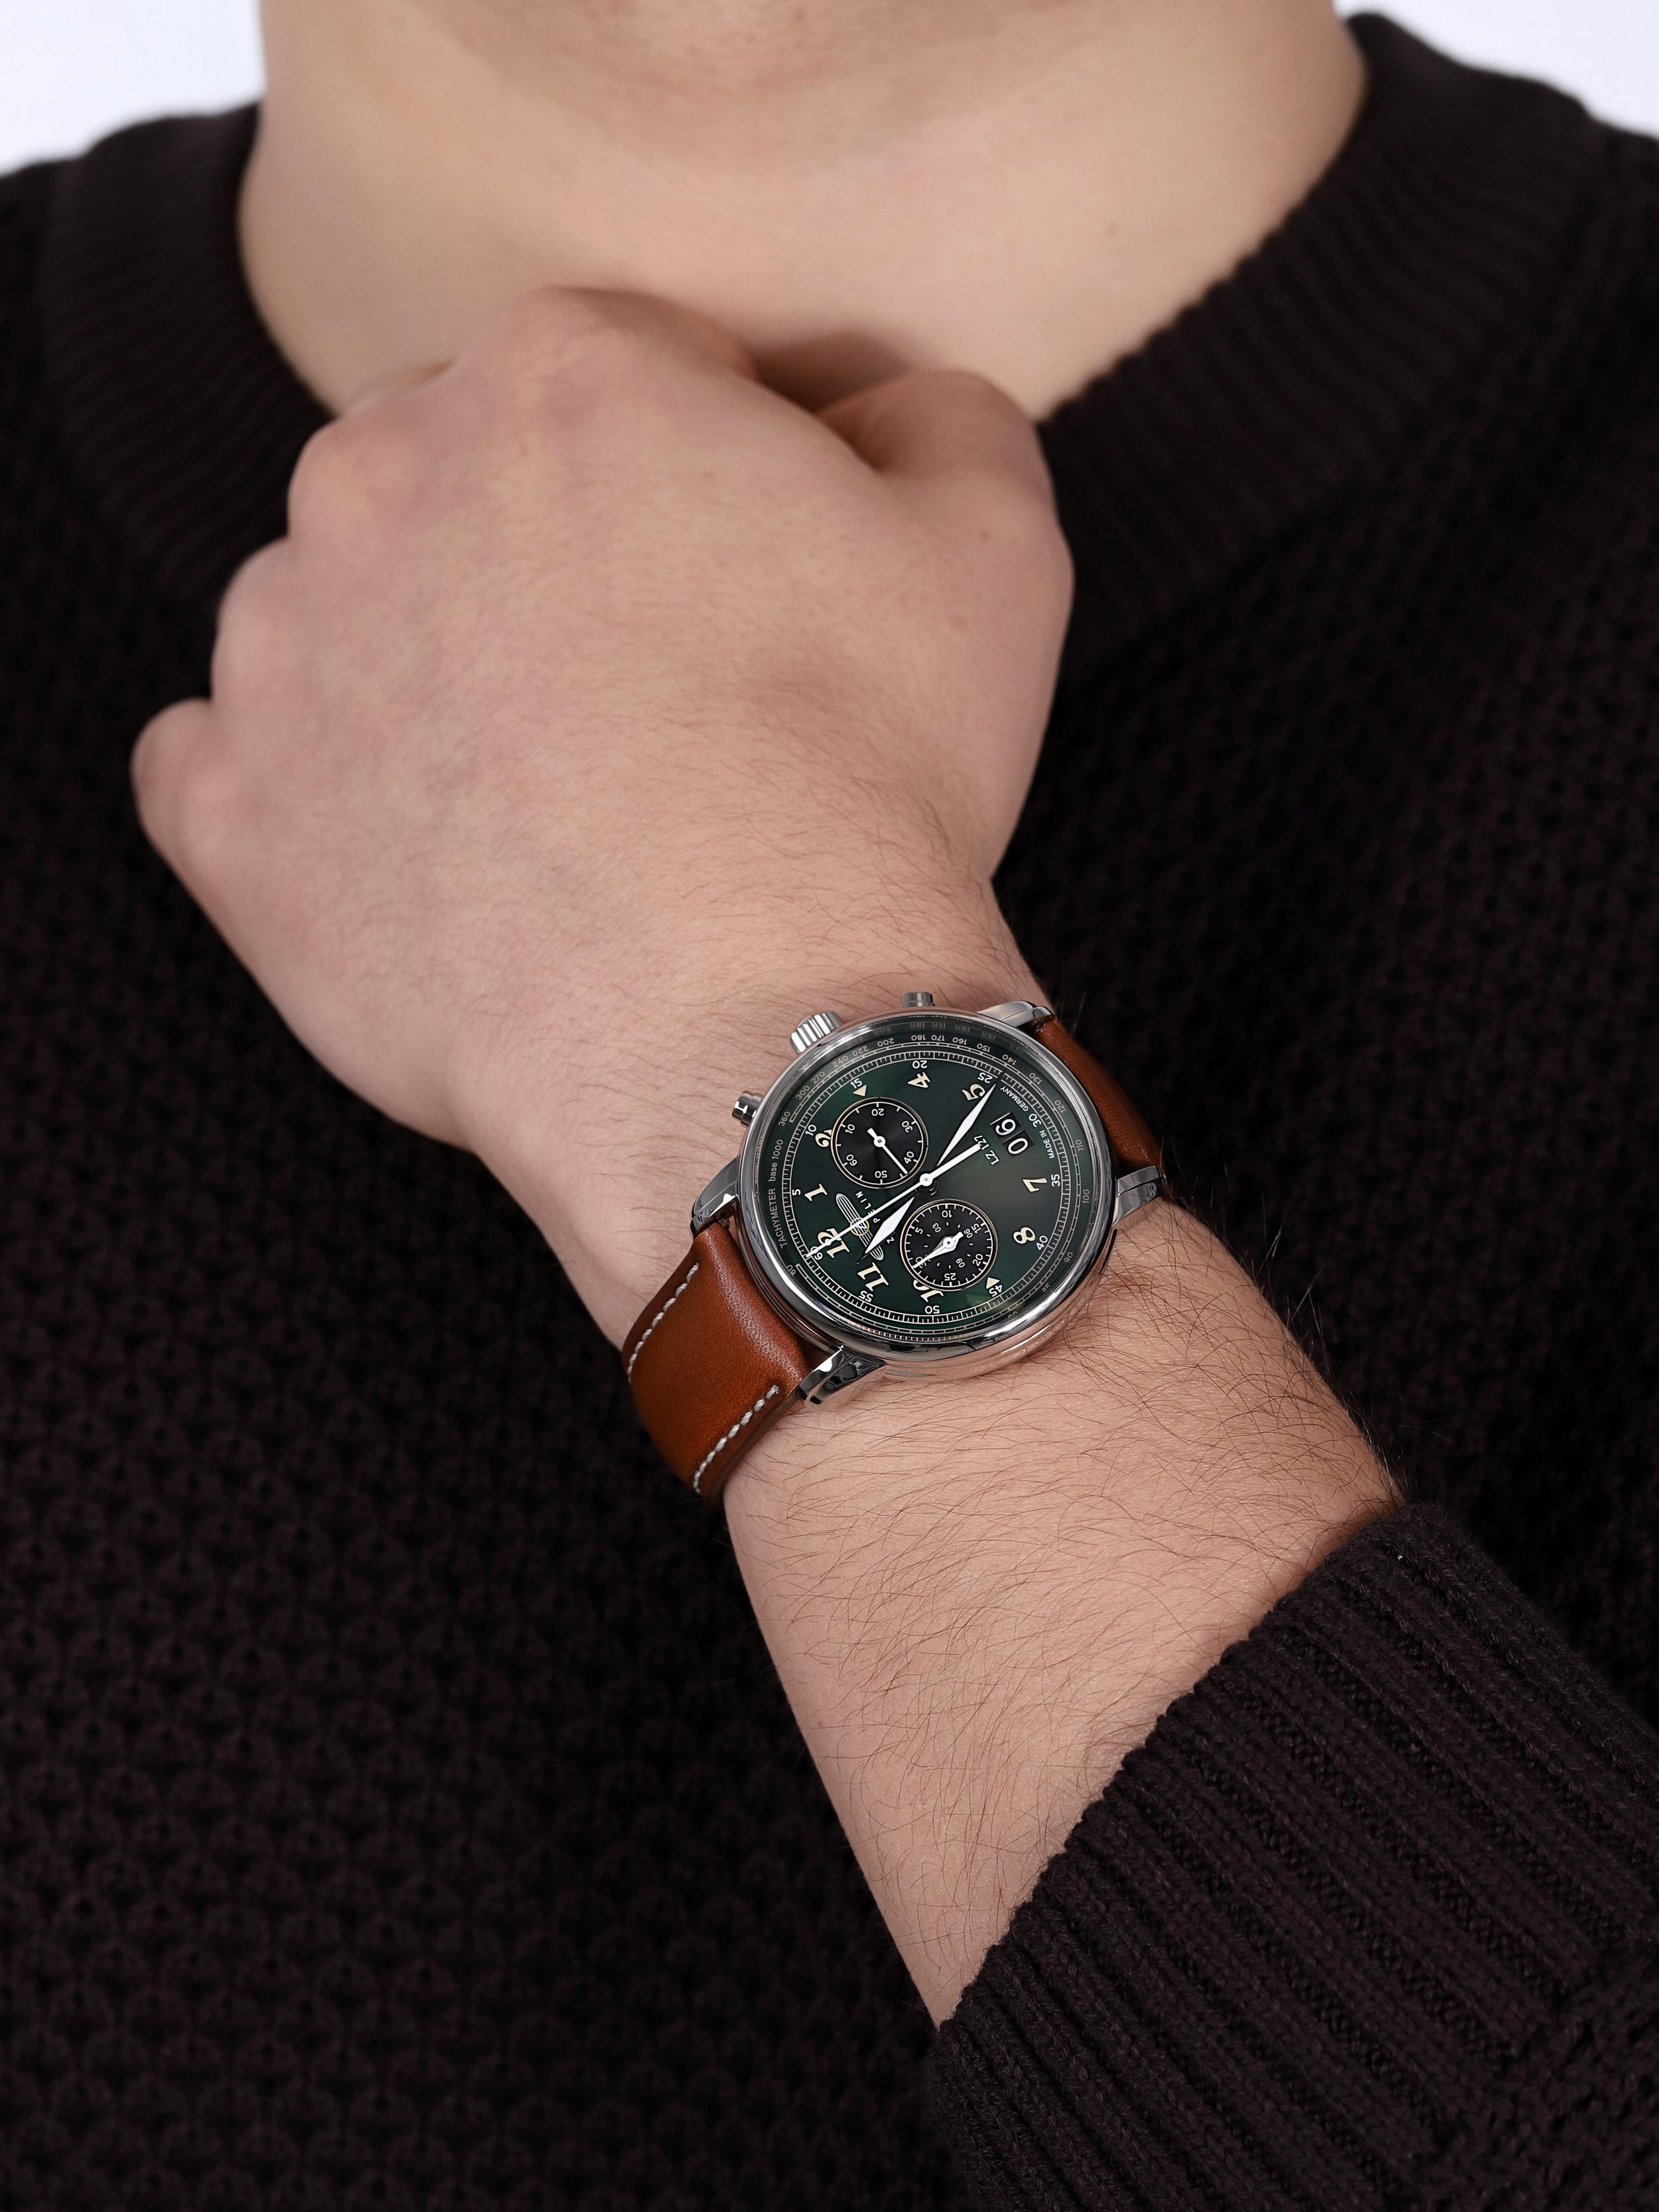 zegarek Zeppelin 8684-4 Count LZ127 Quartz męski z tachometr Count